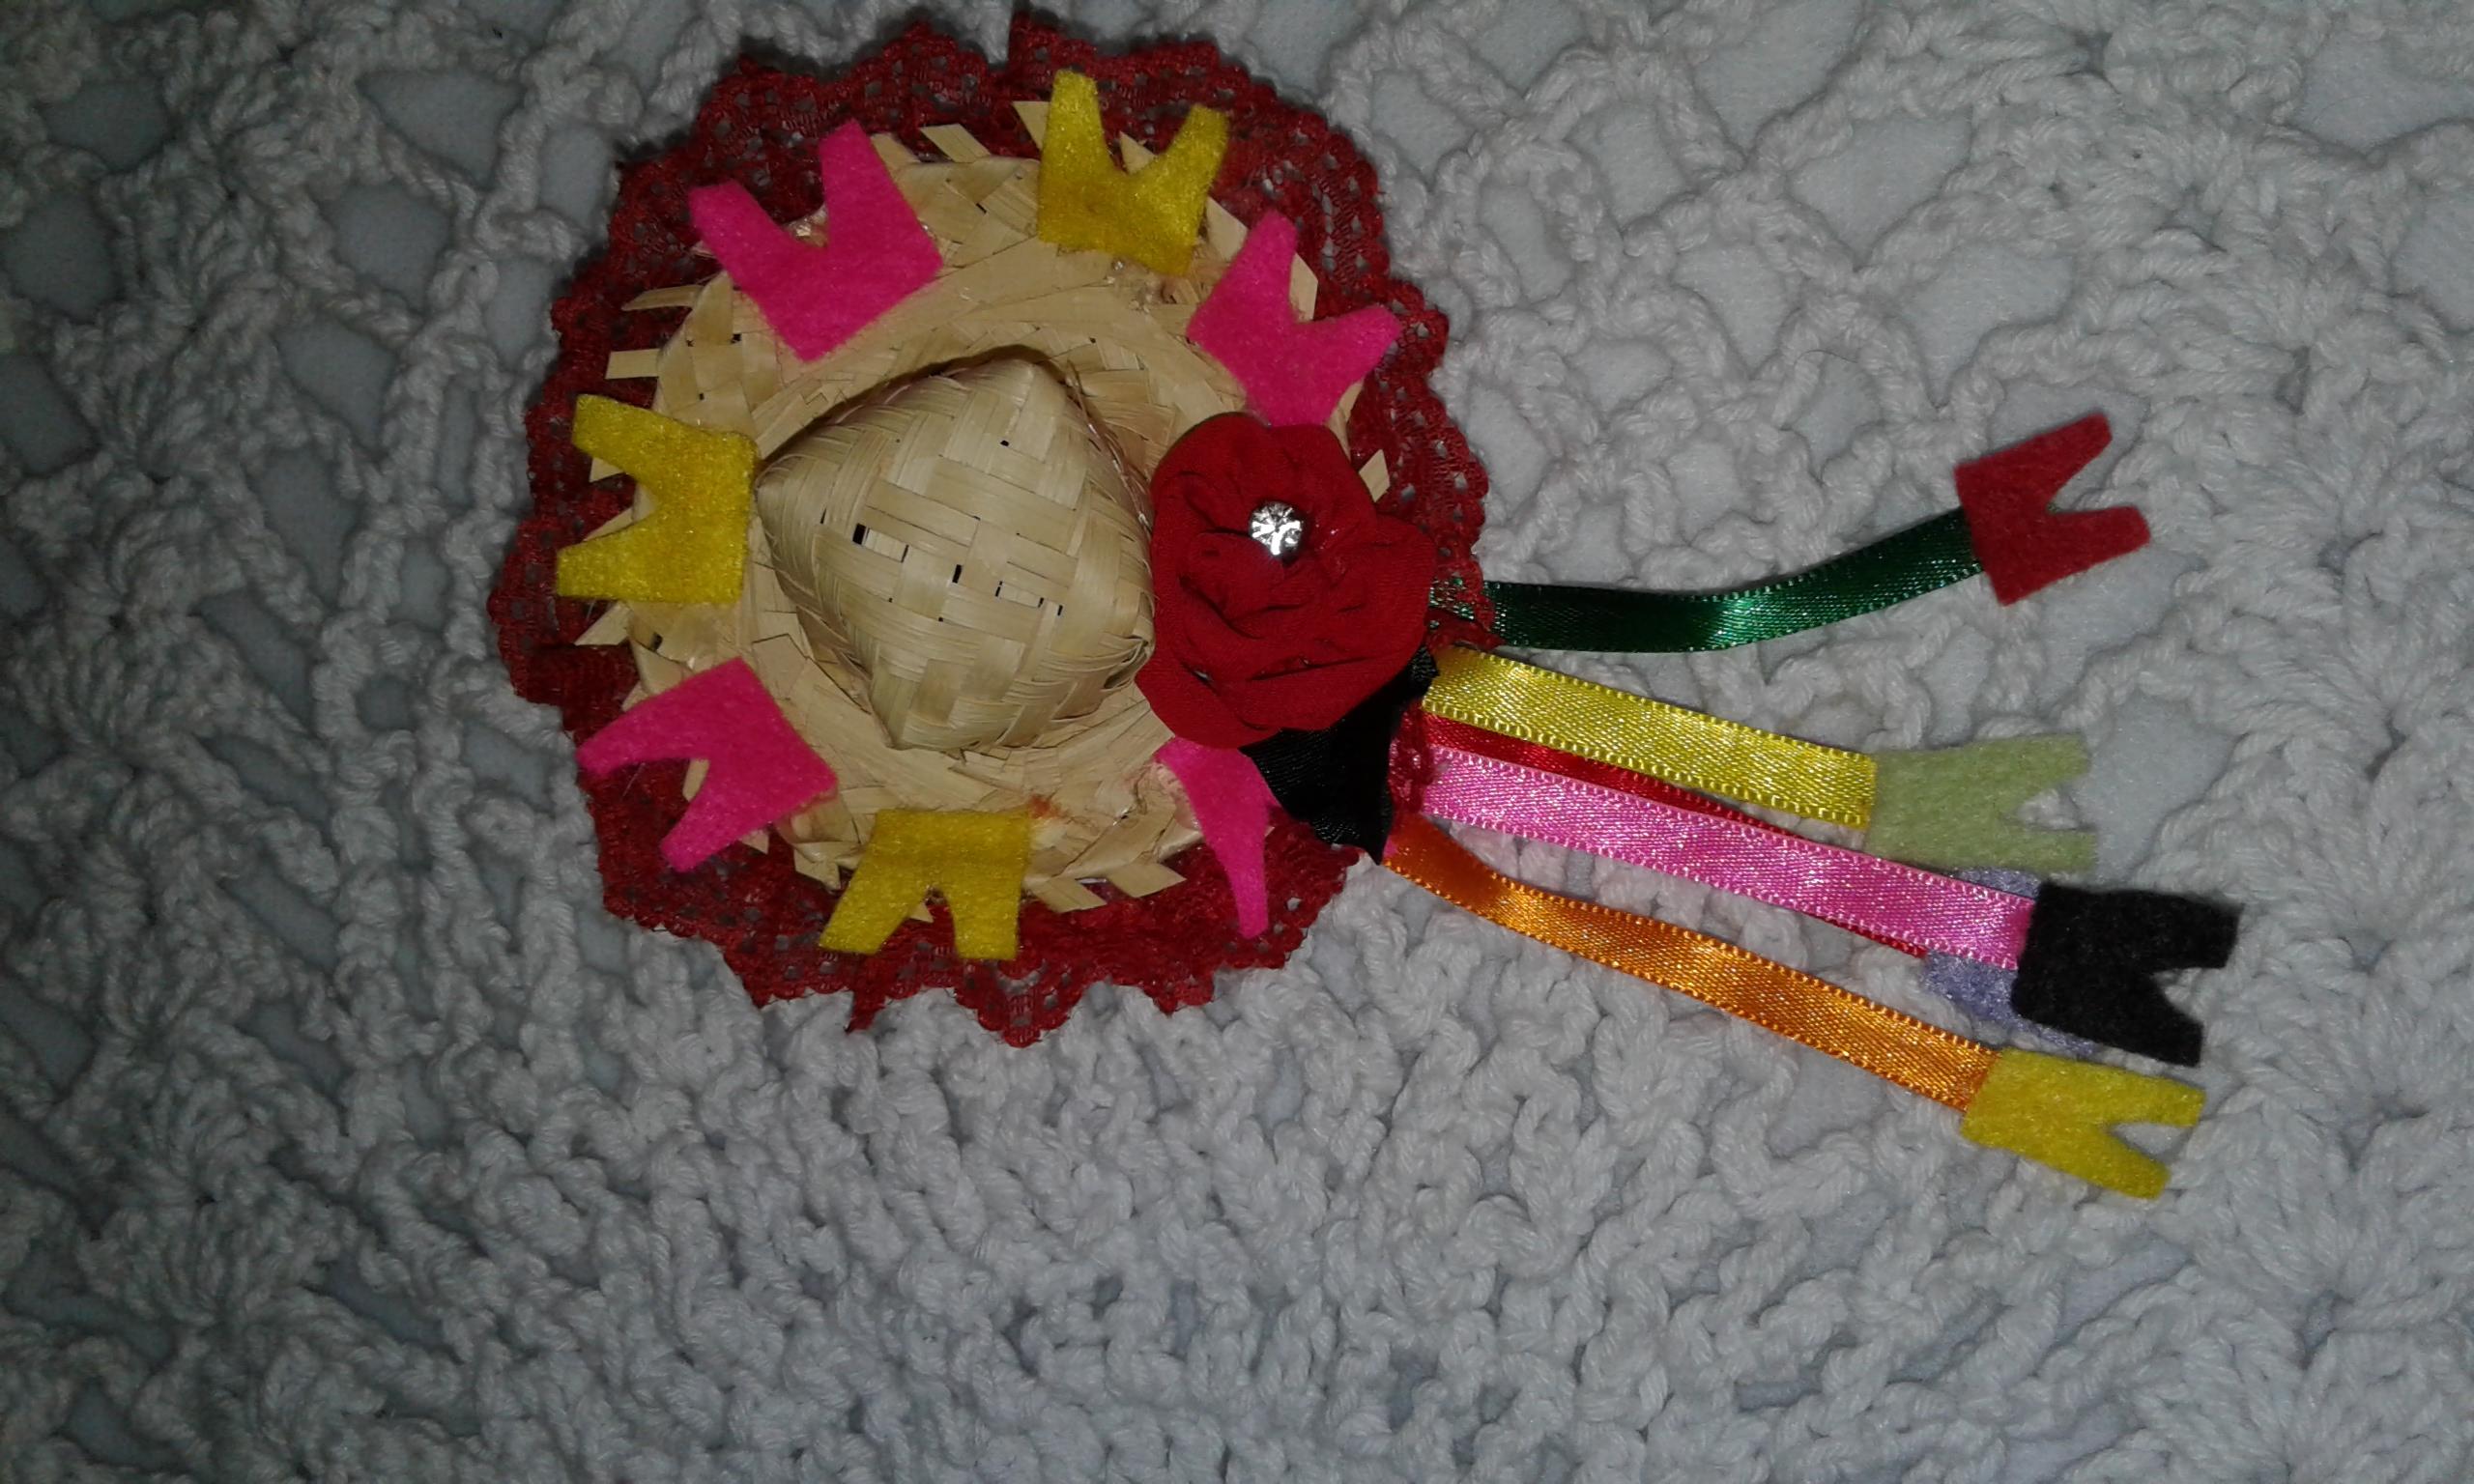 b775a2672b4c1 Presilha de cabelo festa junina no elo artesanato jpg 2560x1536 Presilha  quadrilha enfeites para festa junina